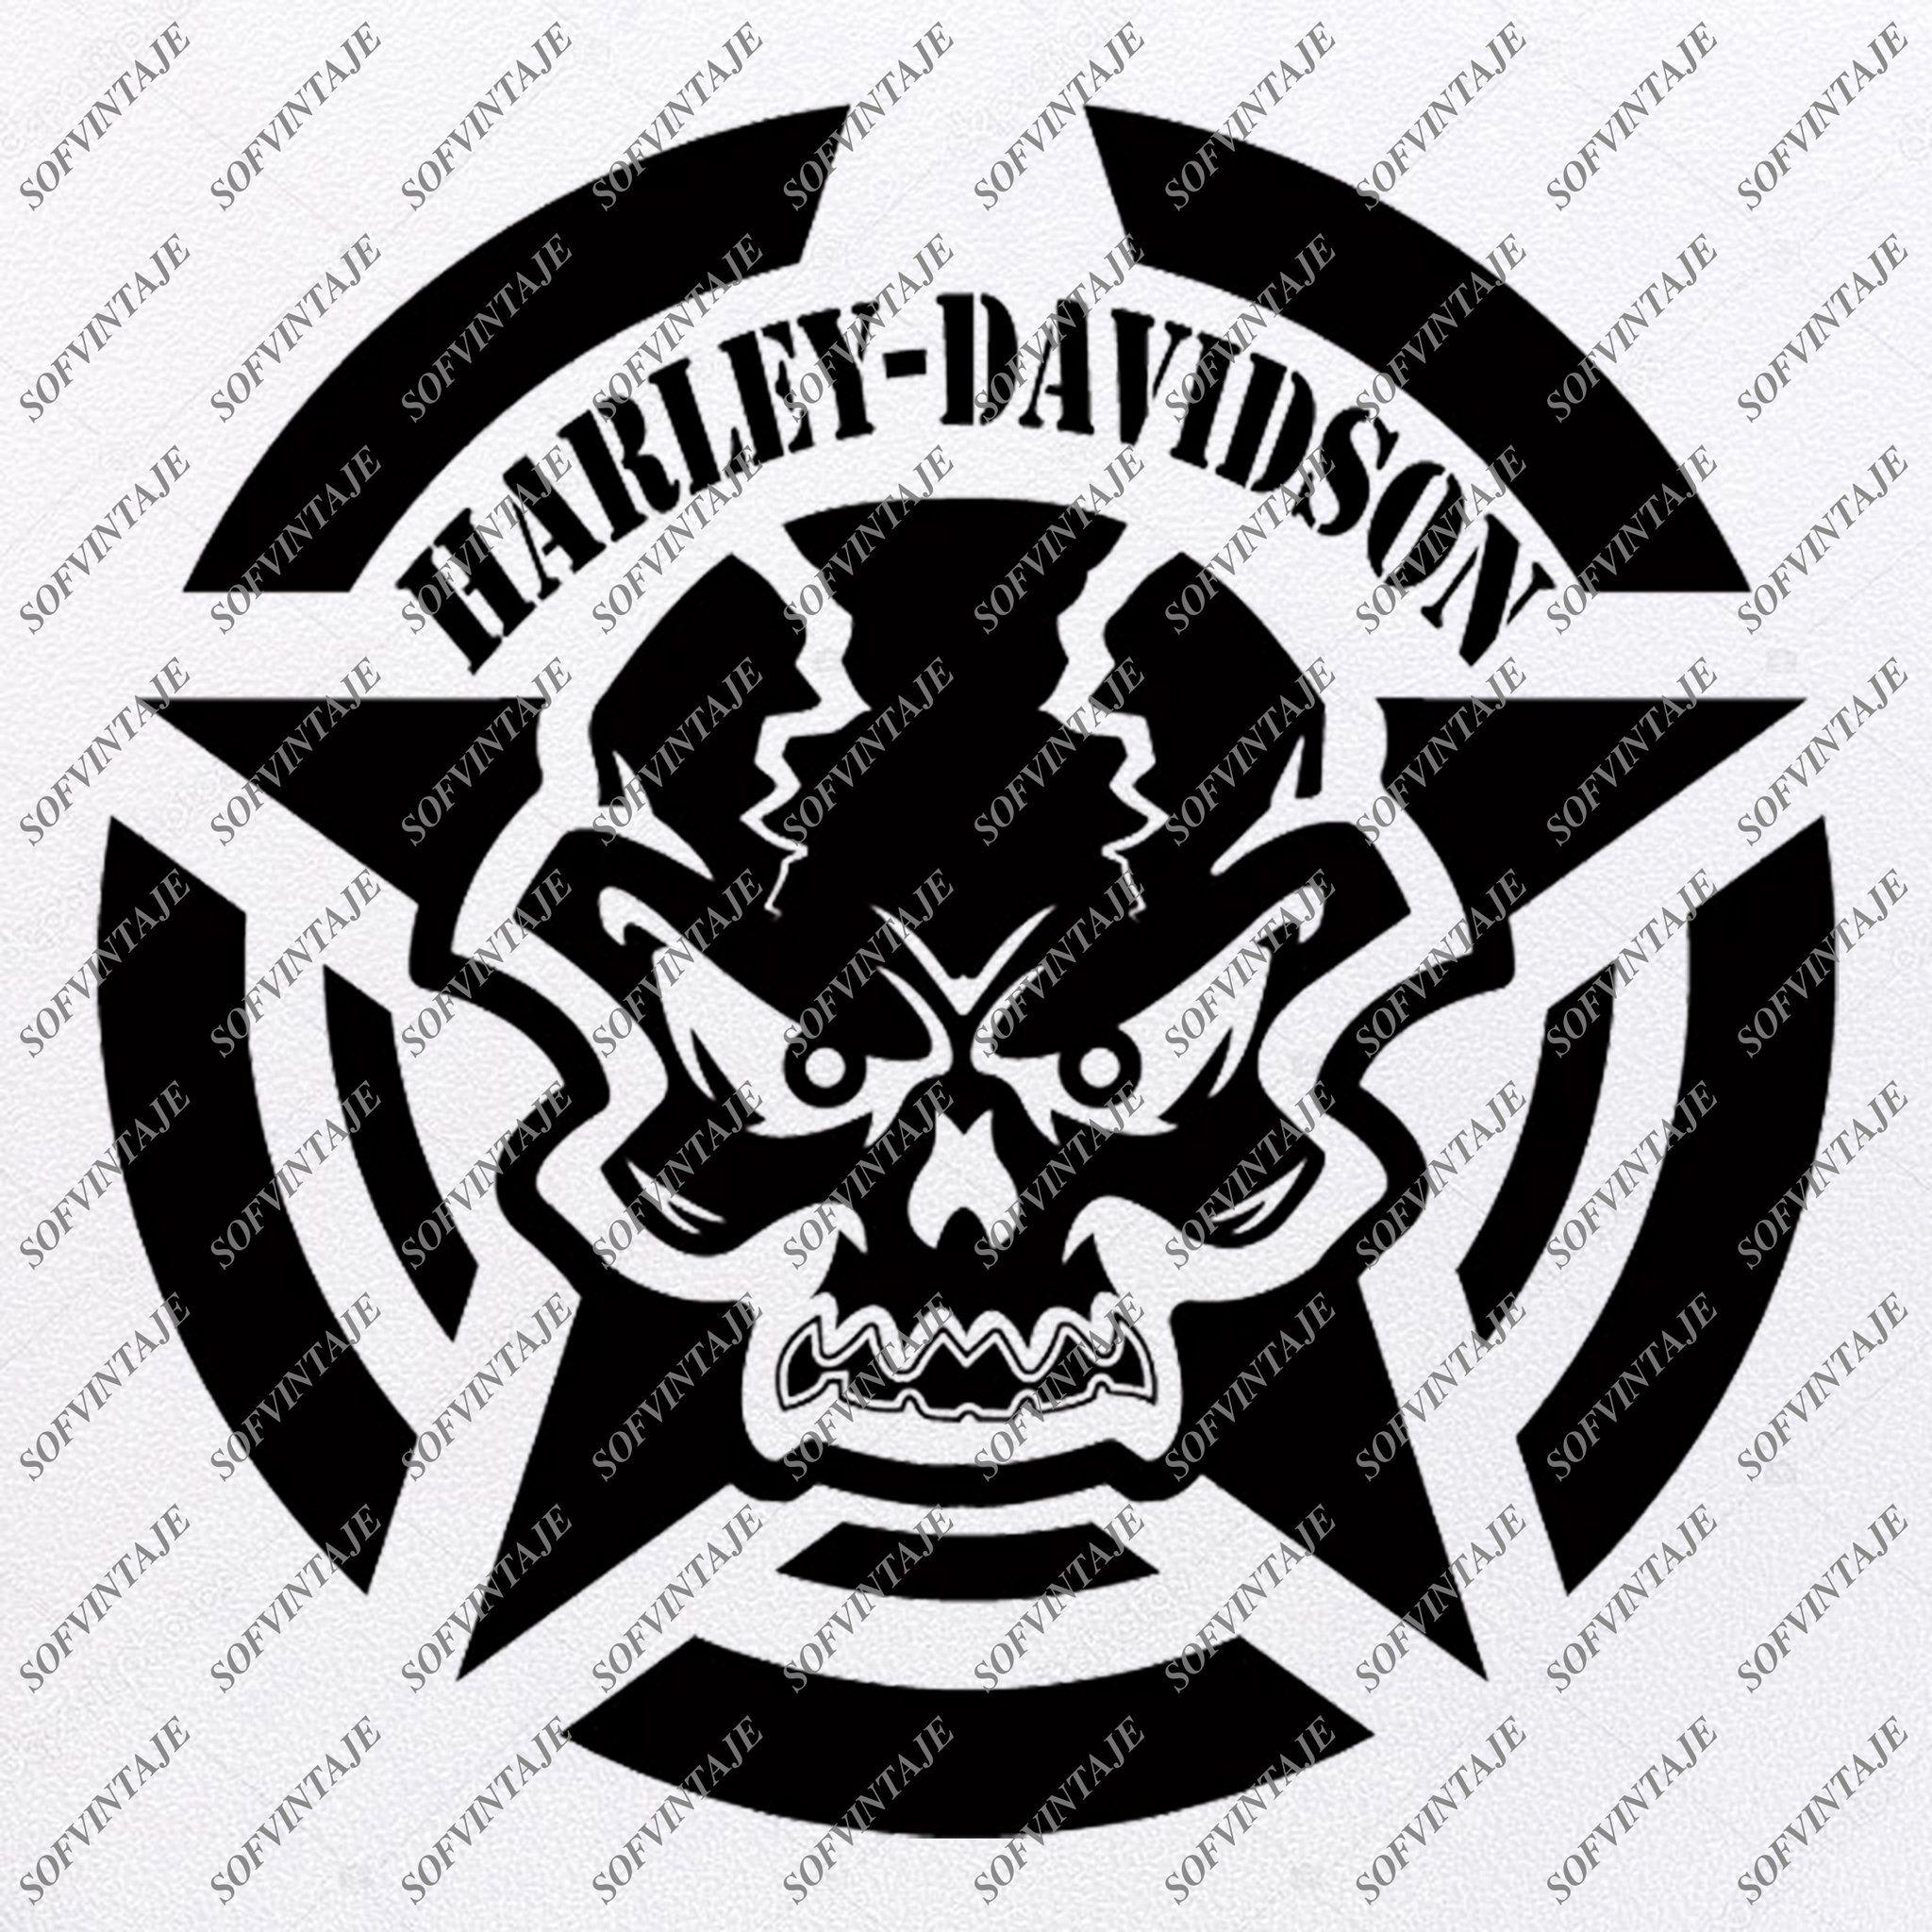 Harley Davidson Svg File Skull Harley Davidson Svg Design Clipart Tat Sofvintaje In 2020 Silhouette Svg Harley Davidson Svg Design